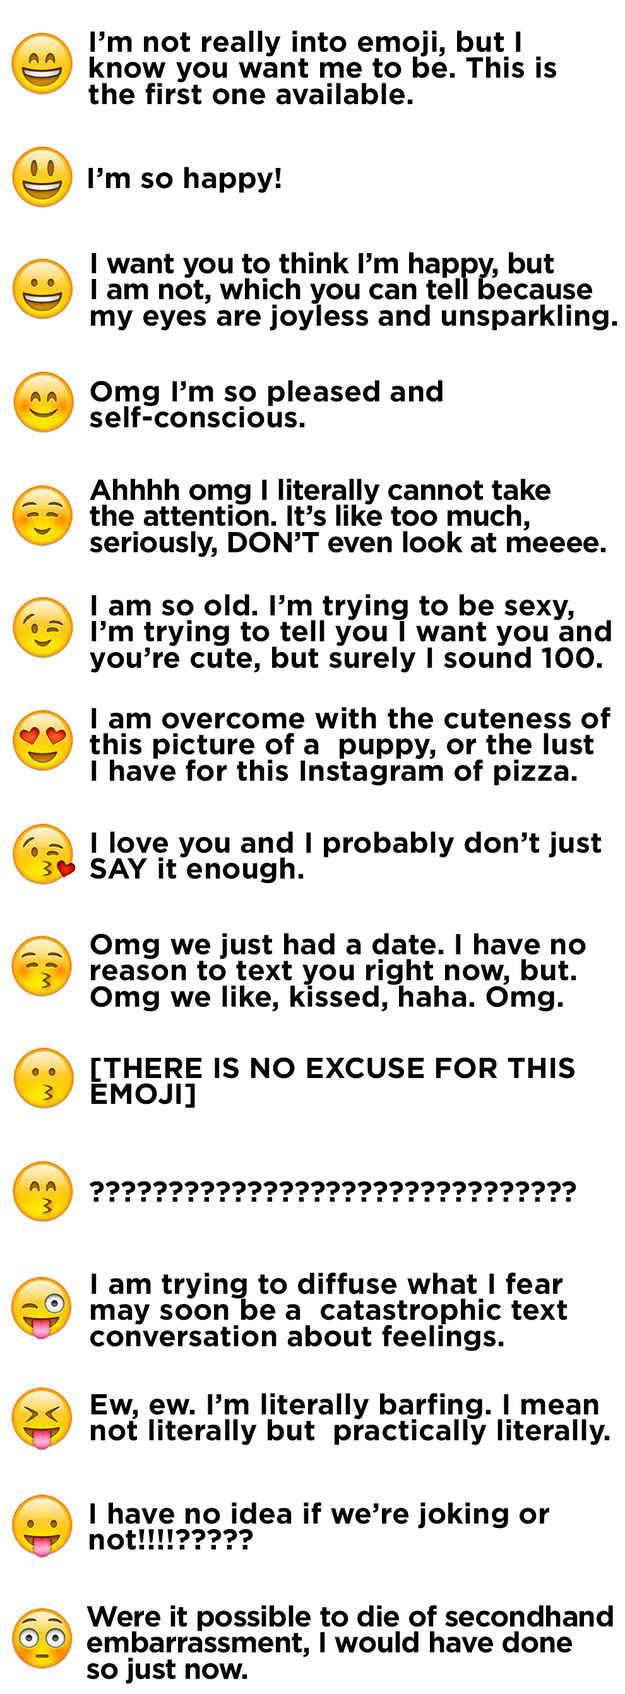 The 58 Yellow Smiley Emoji, Defined Hehehe Funny emoji